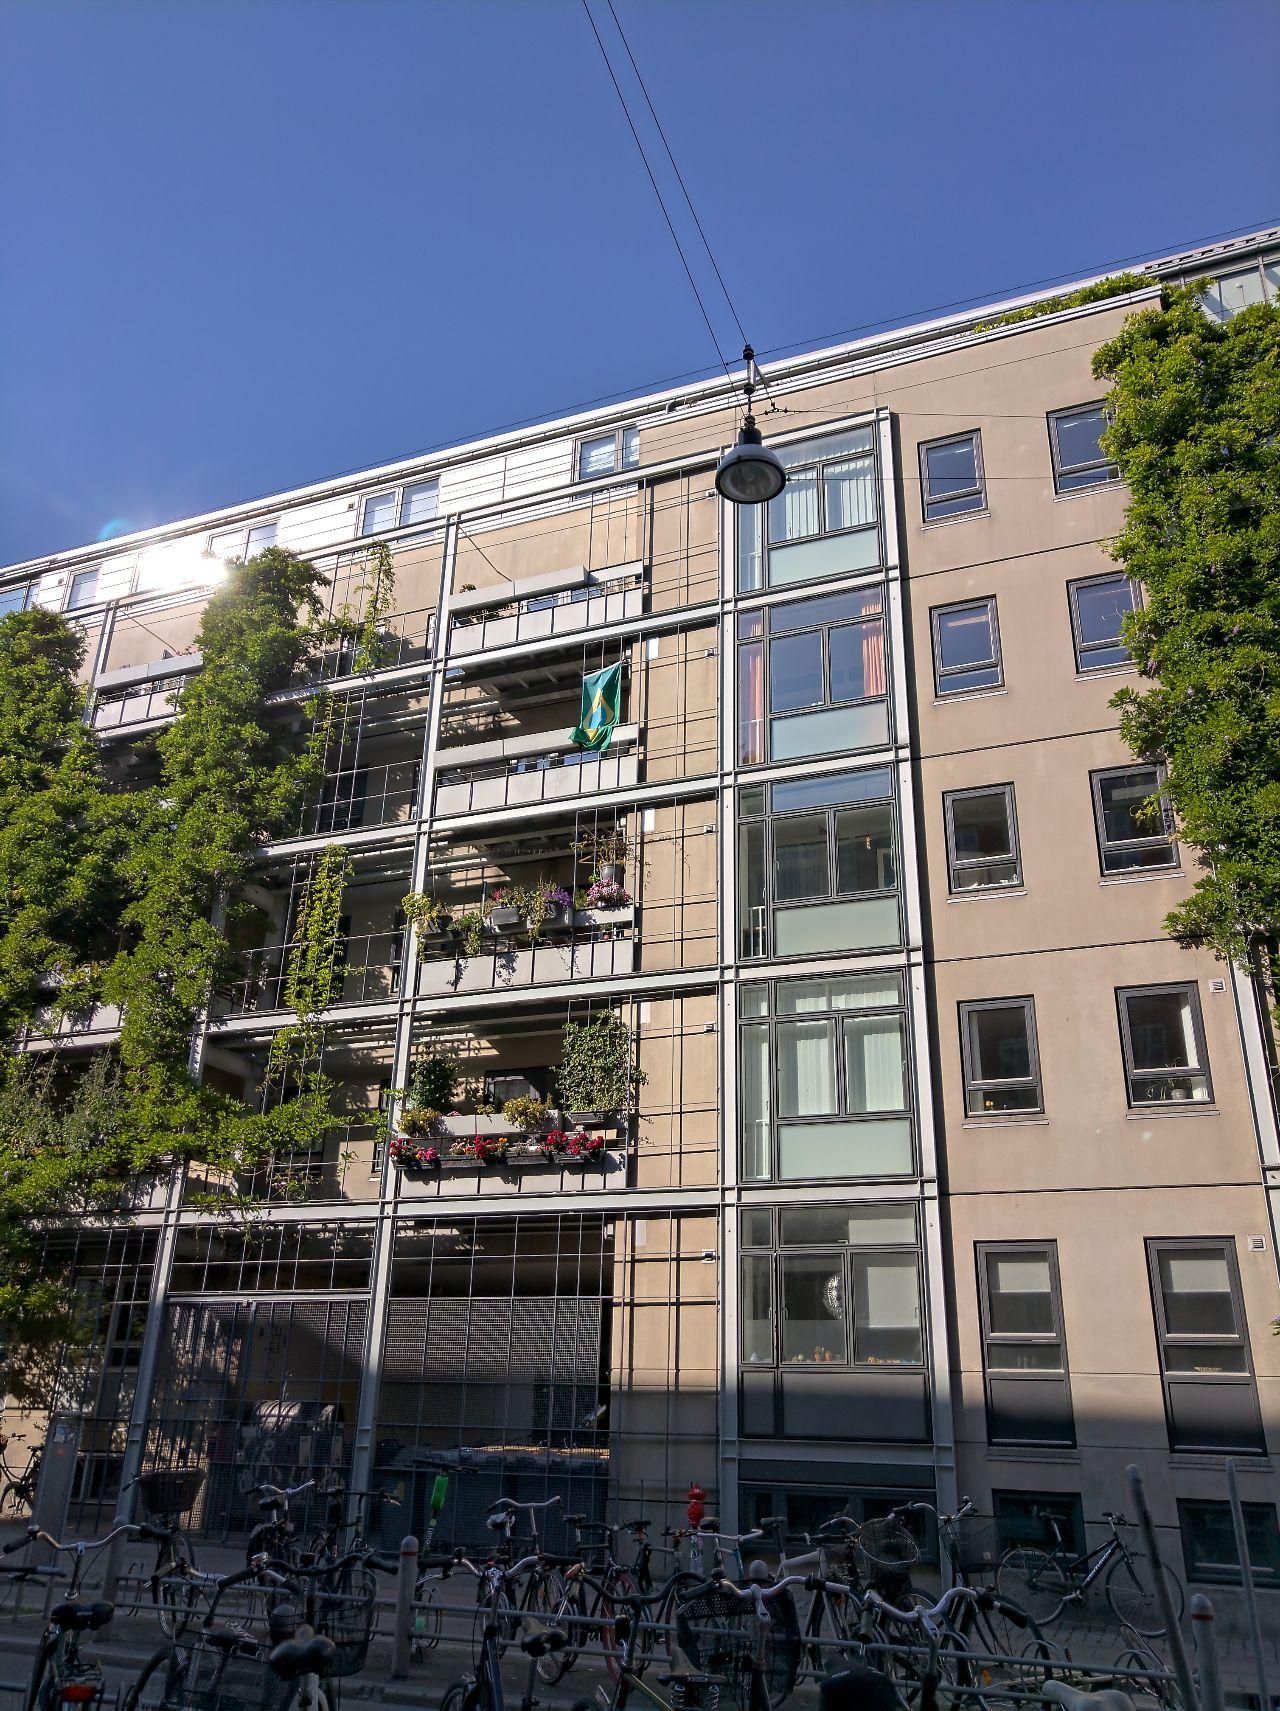 Brazilian flag waving from an apartment in Copenhagen